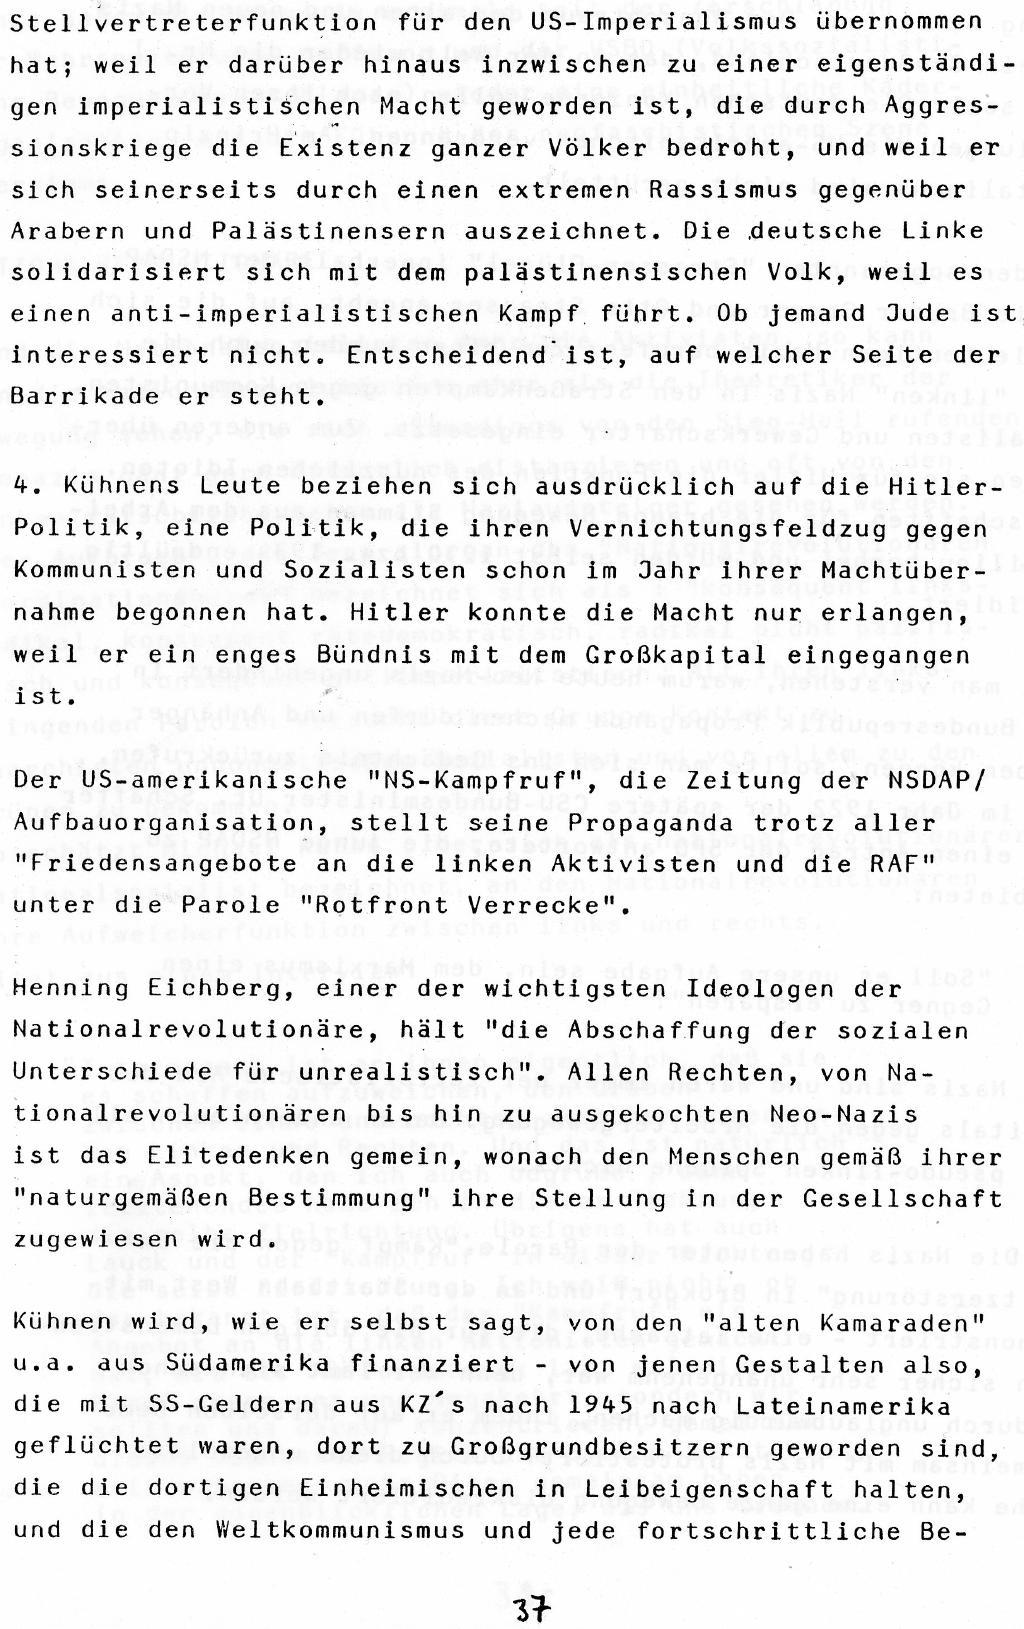 Berlin_1983_Autonome_Gruppen_Faschismus_im_Kapitalismus_37